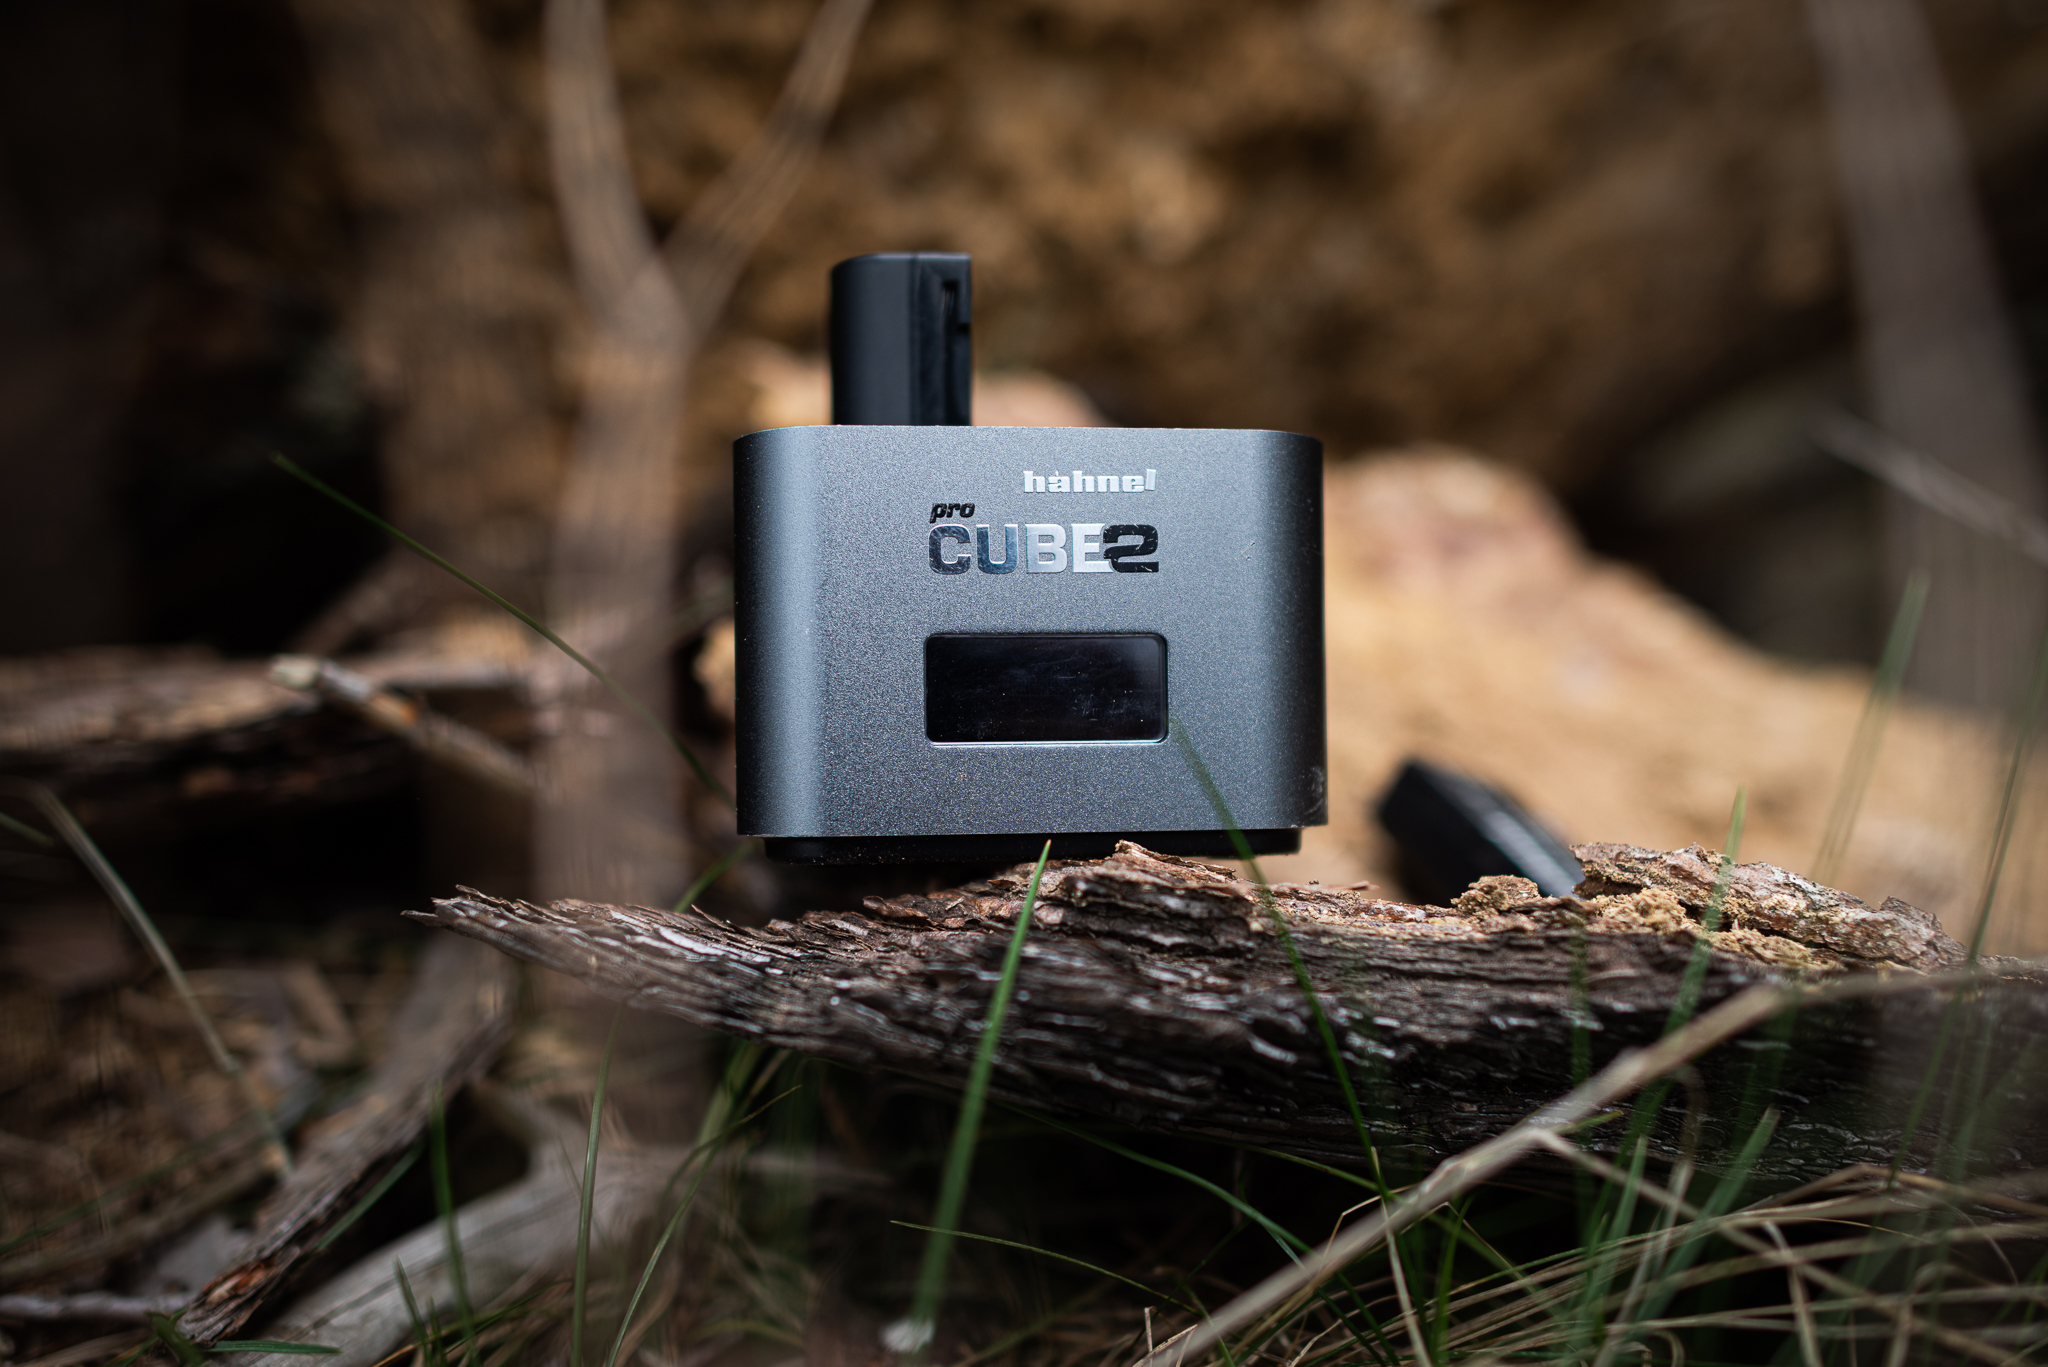 Ładowarka Hahnel Pro Cube 2 w lesie